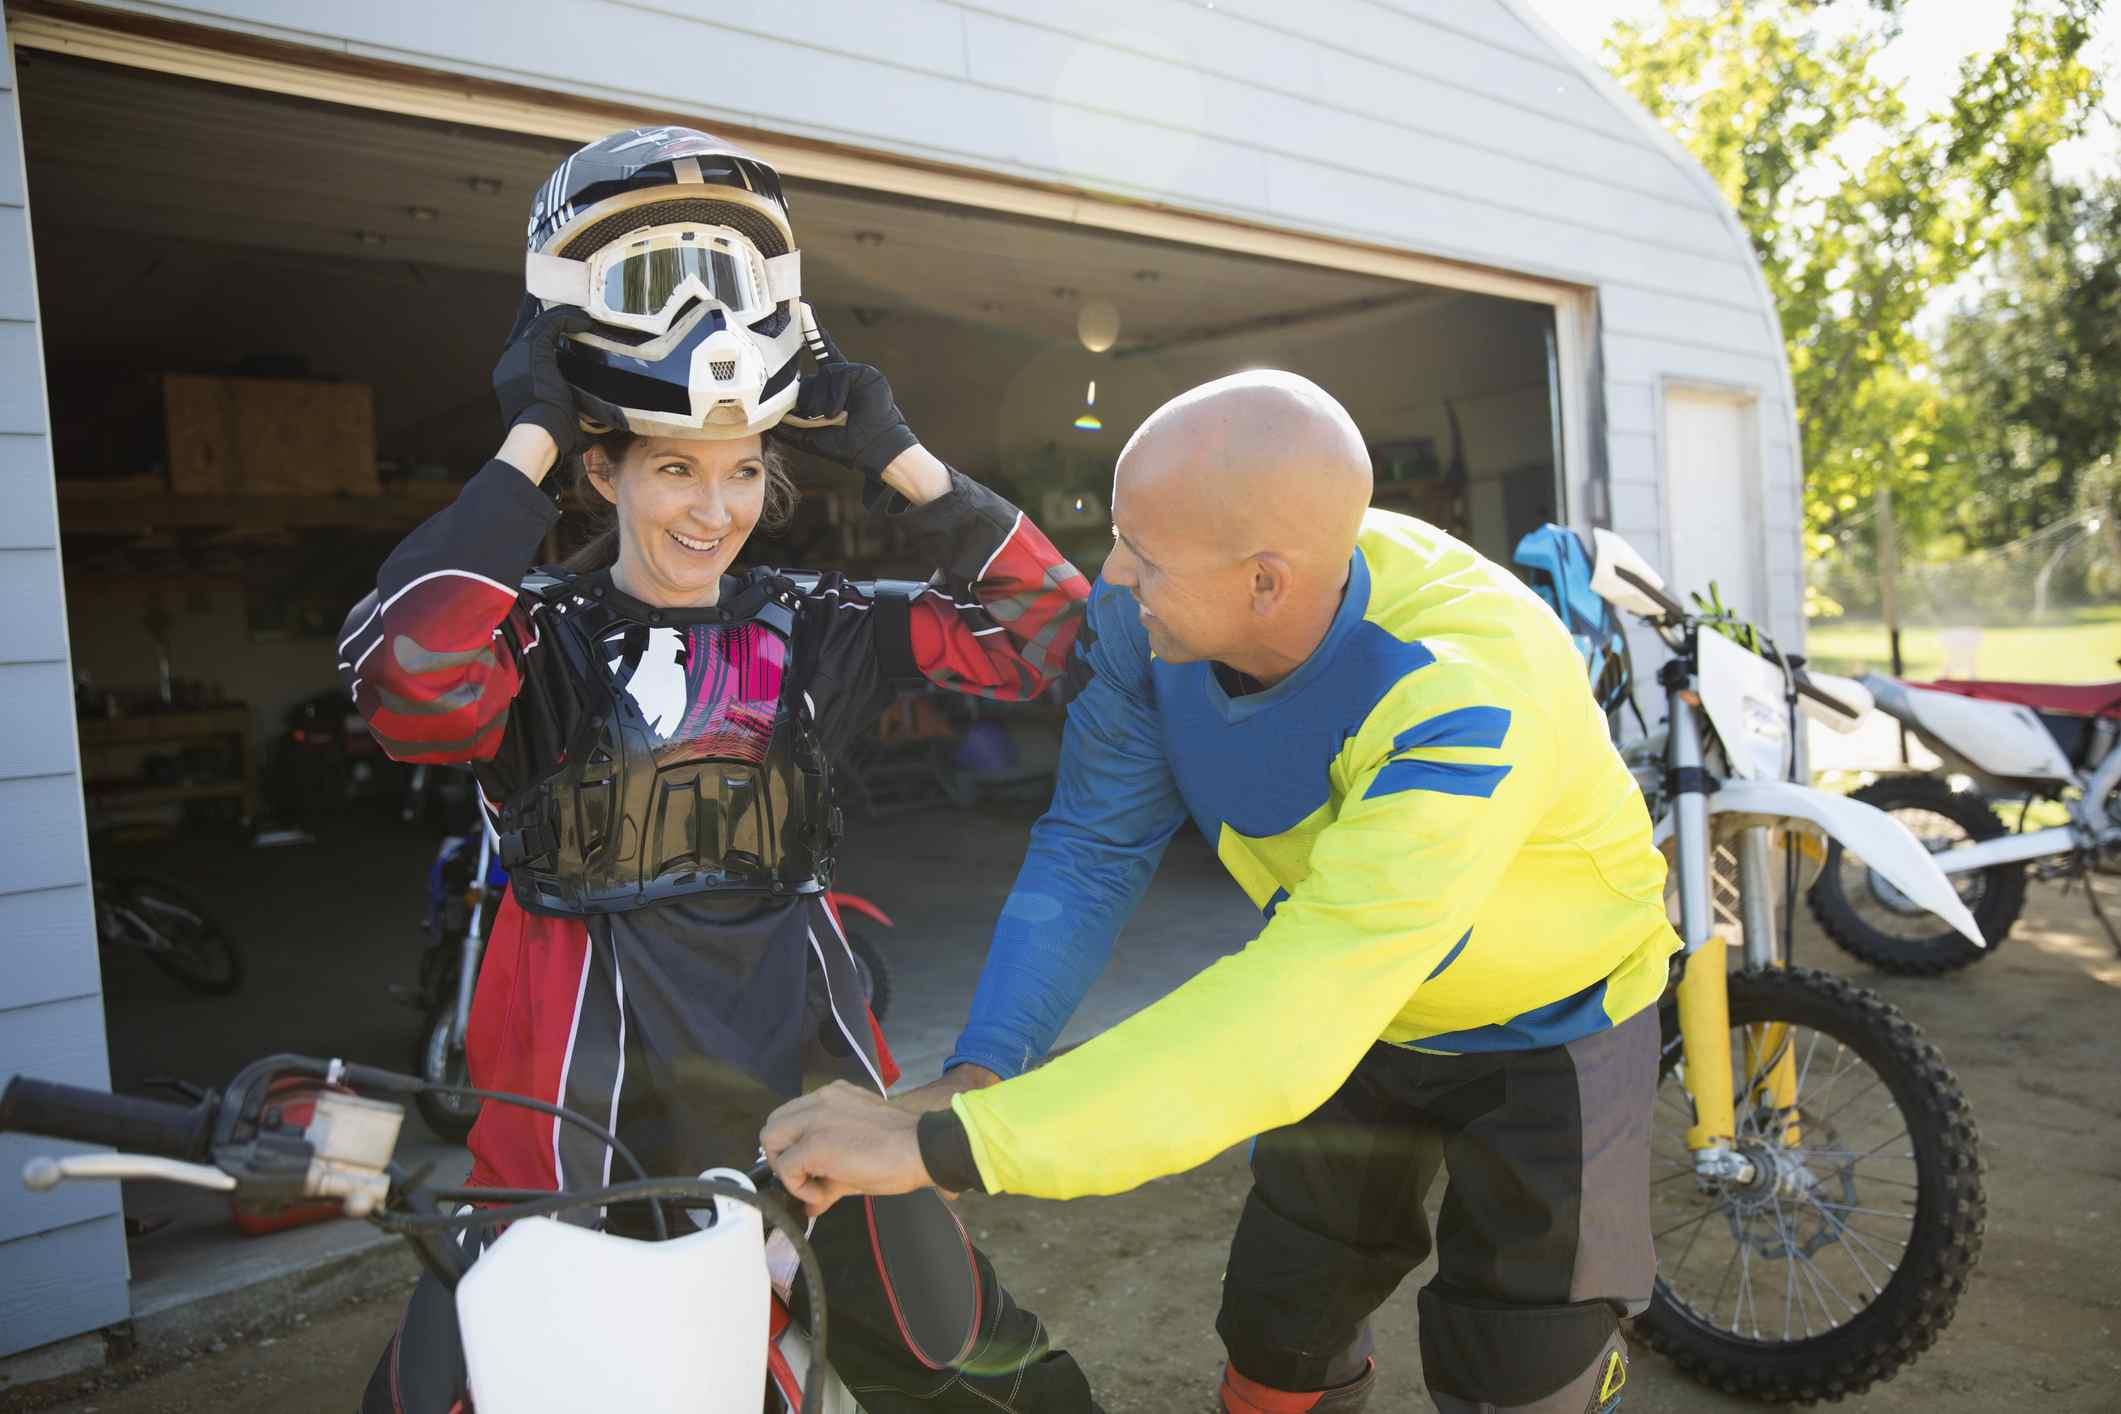 Woman putting on dirtbike gear